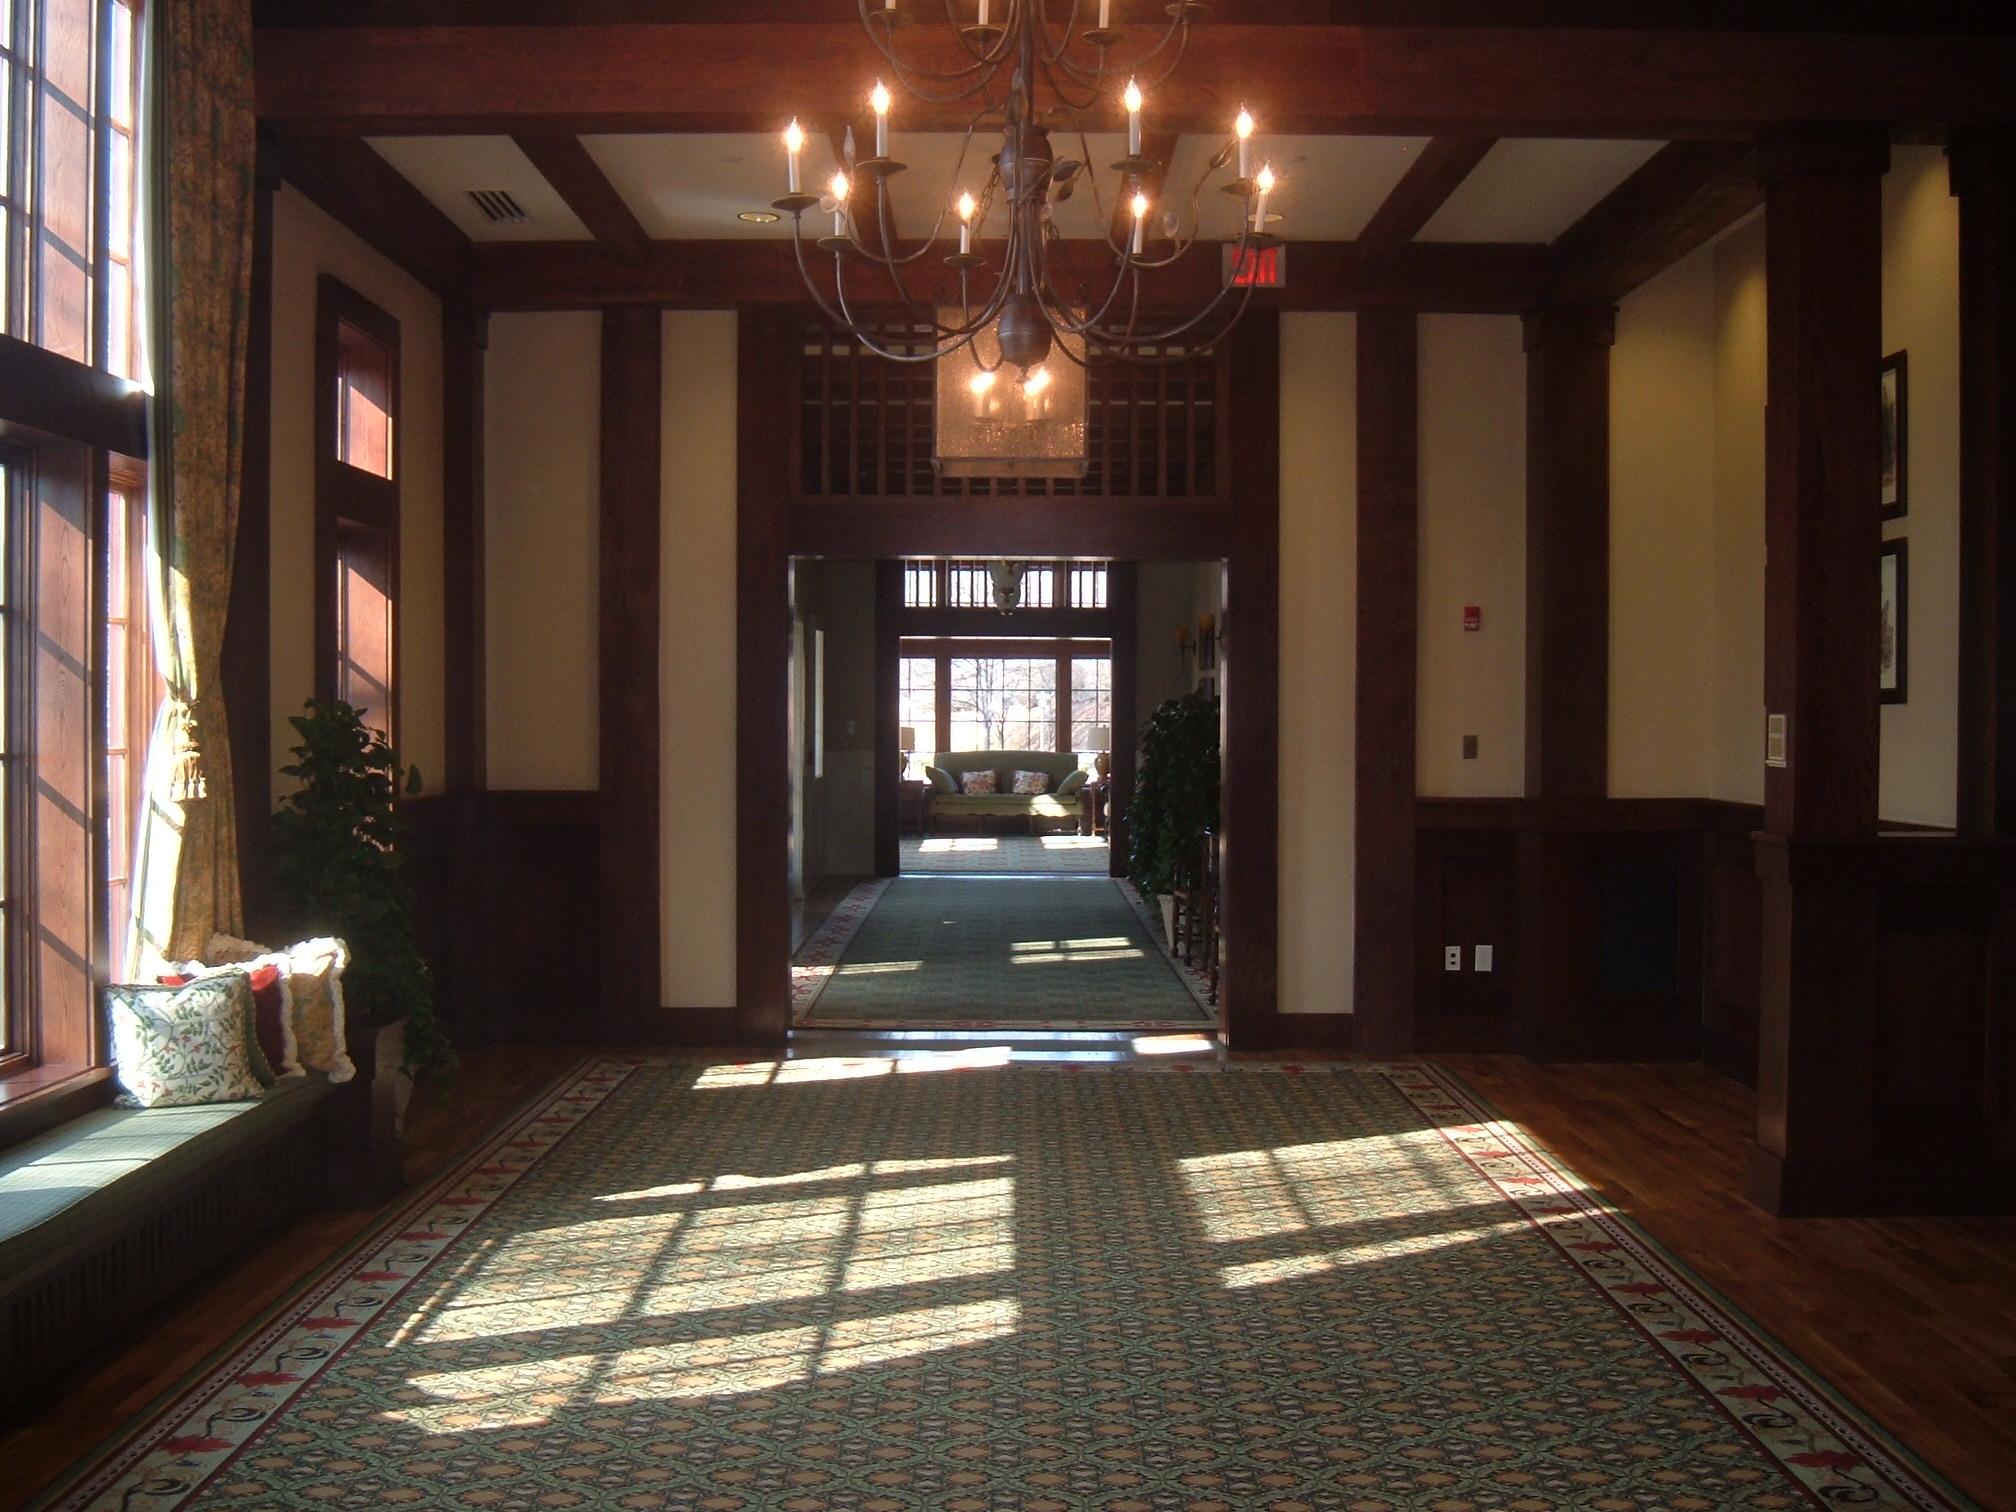 Boar's Head Inn Interior